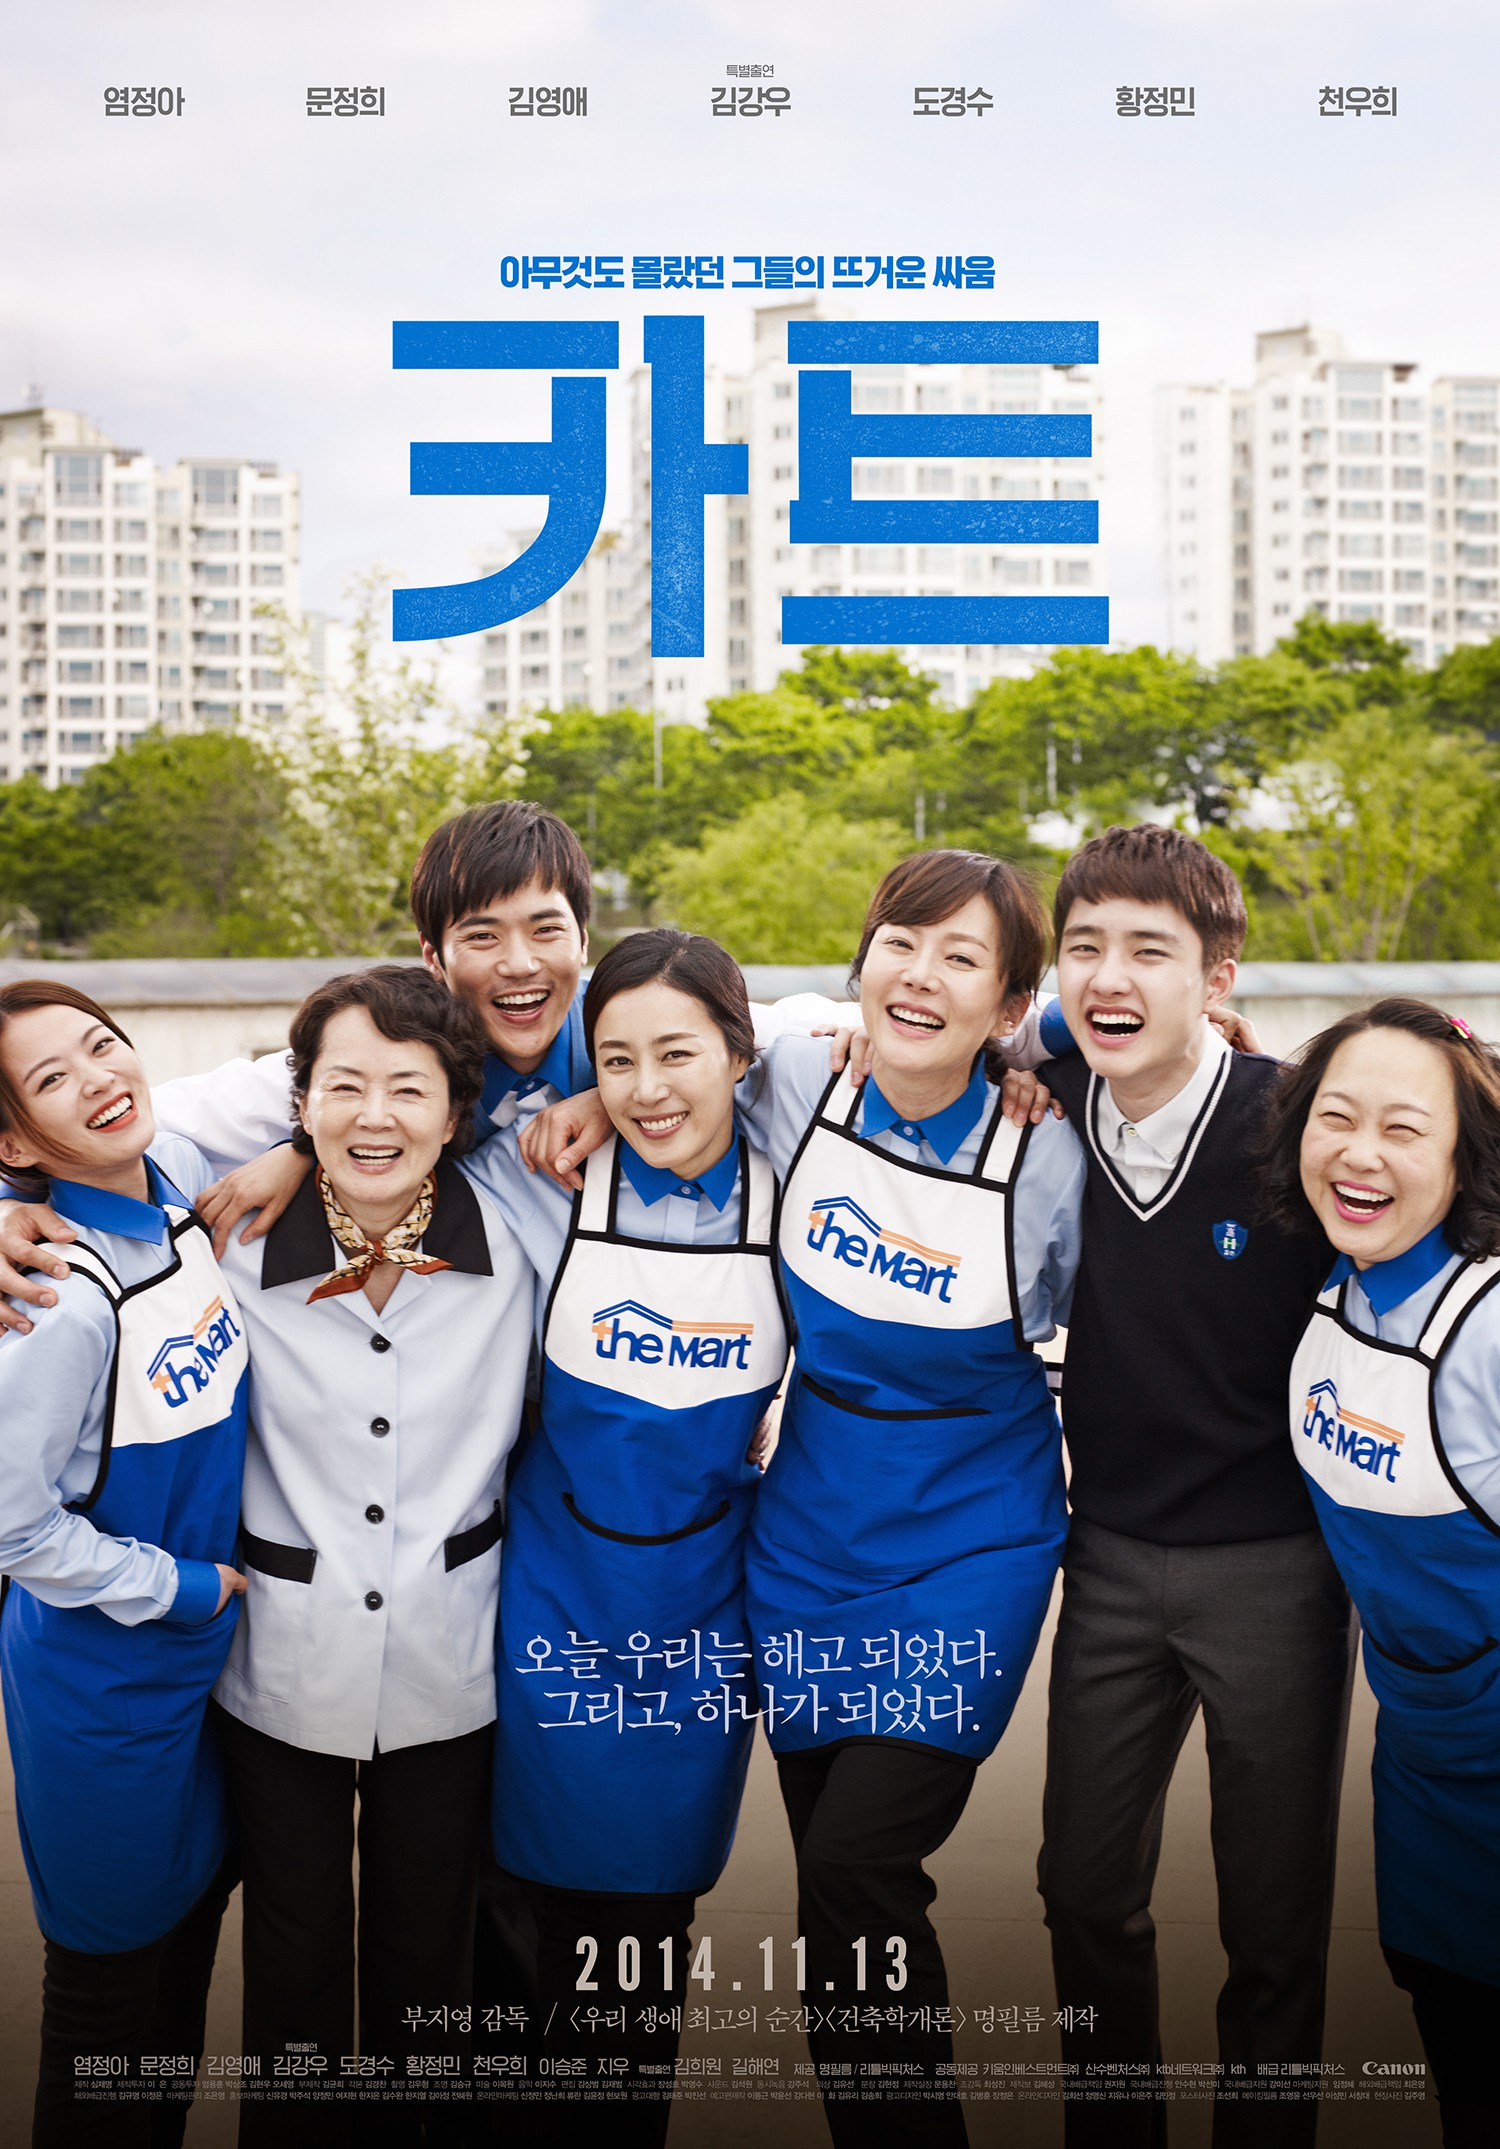 Cart (2014) Cart_(Korean_Movie)-p1